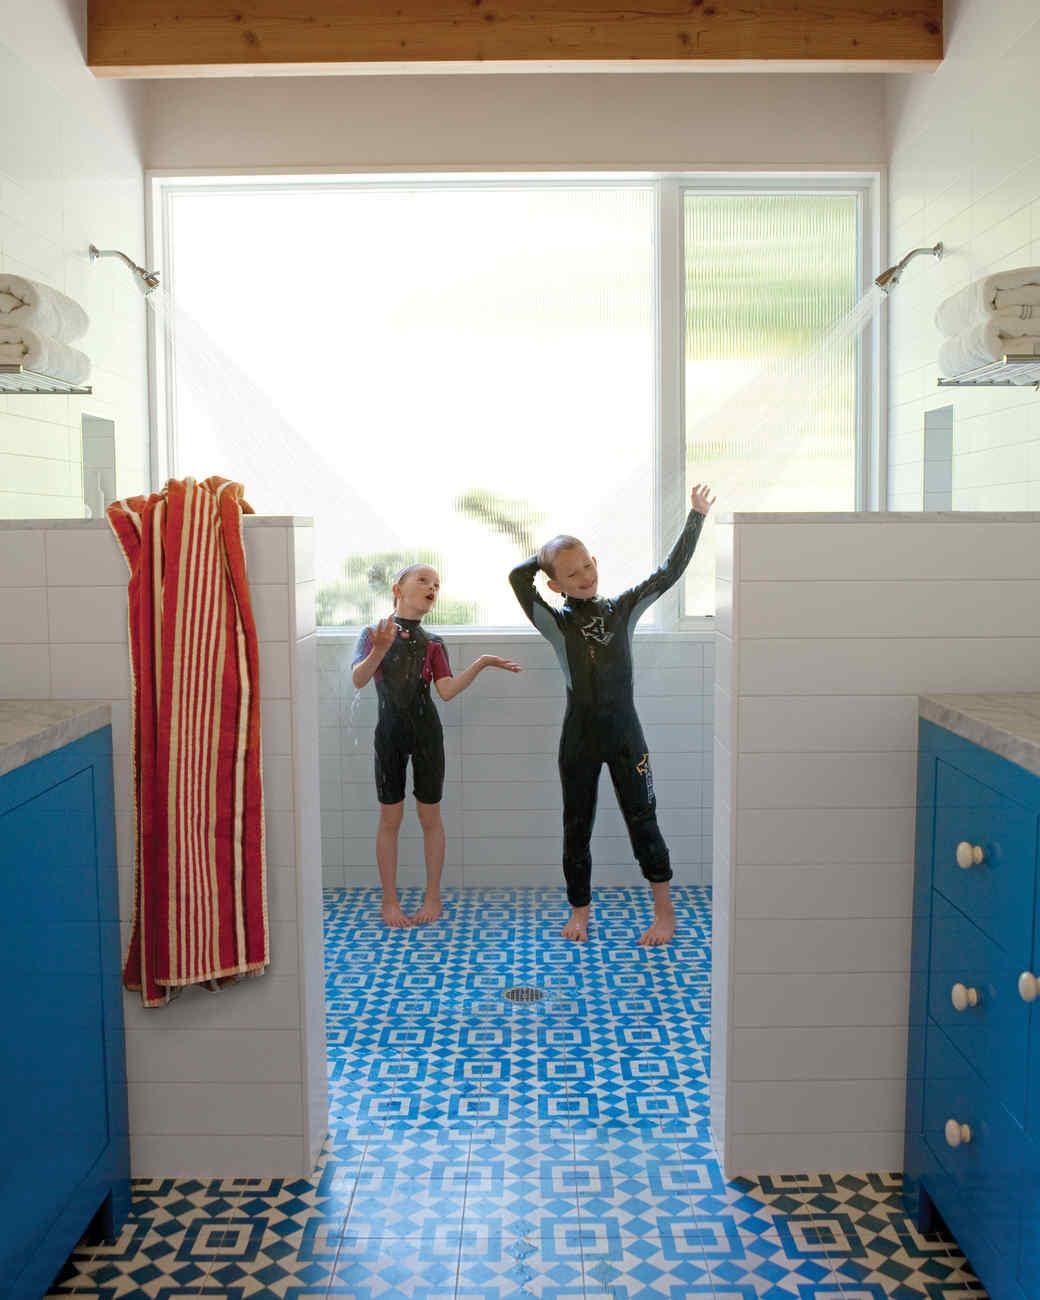 beach-house-showers-0811mld107442.jpg